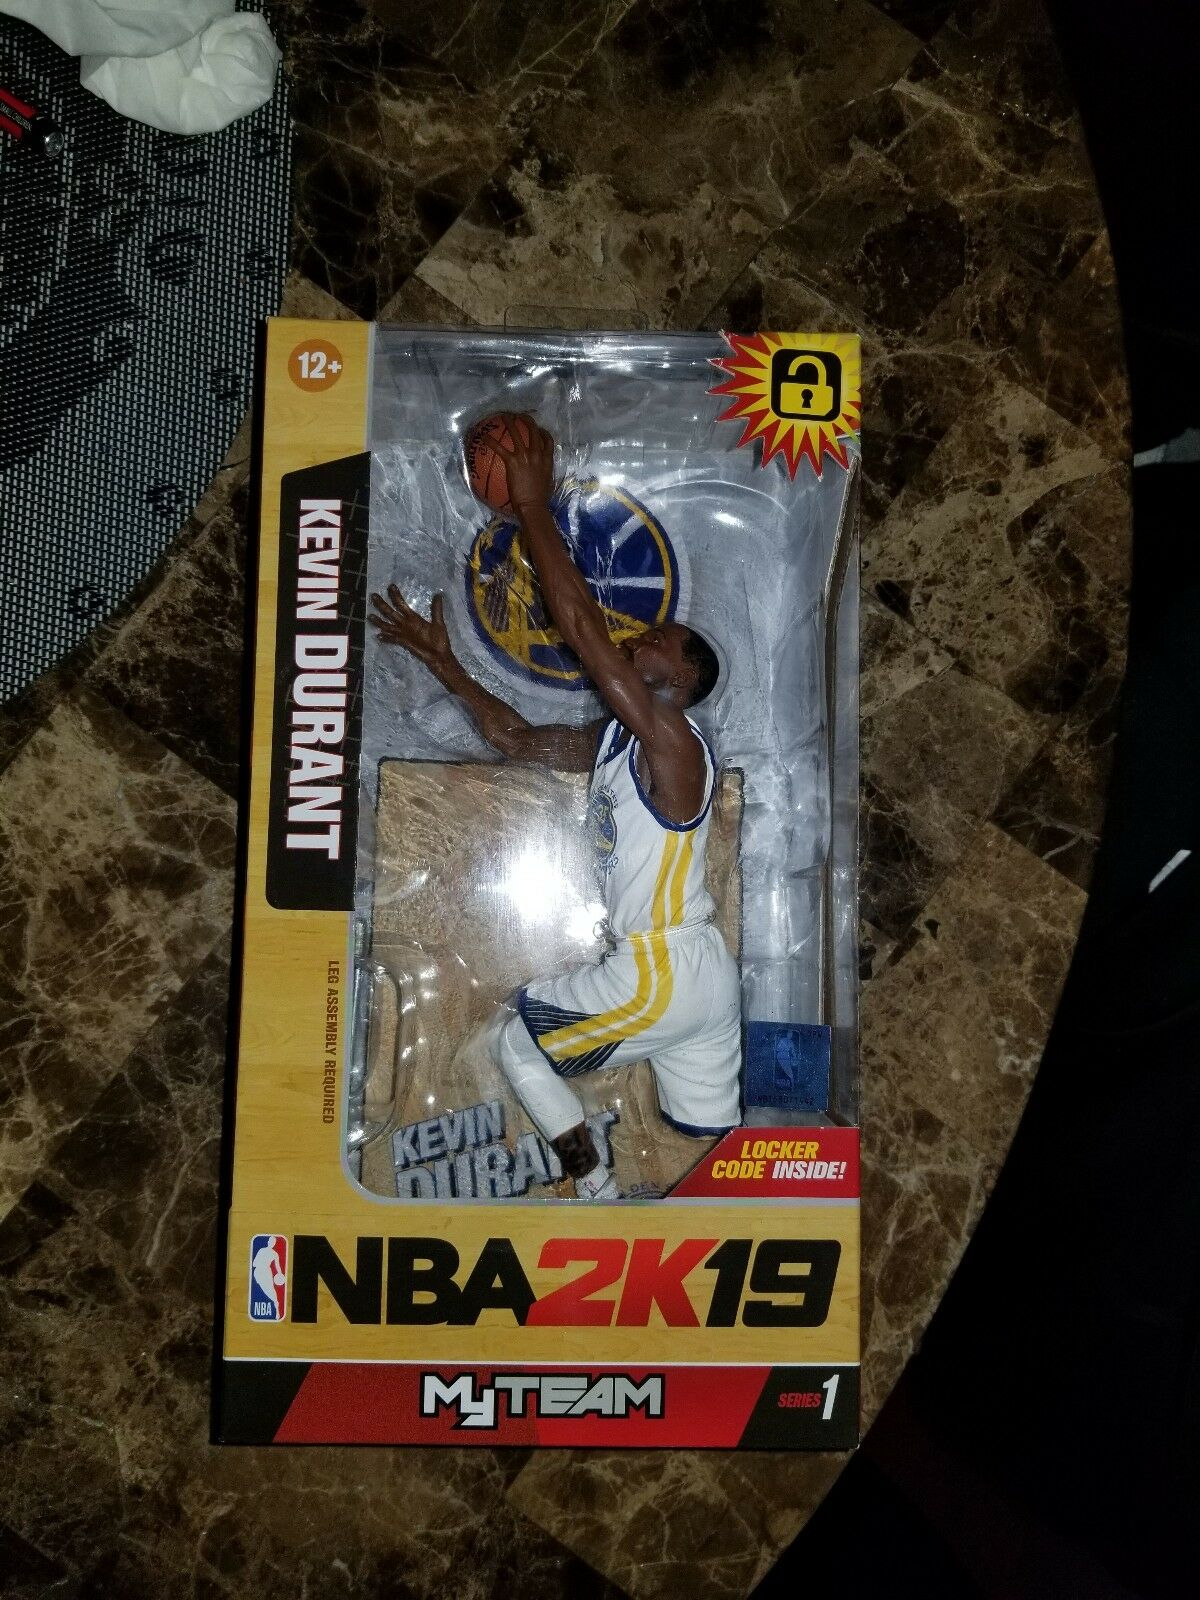 McFarlane Walmart Exclusive NBA 2K19 Action Figure Kevin Durant golden State